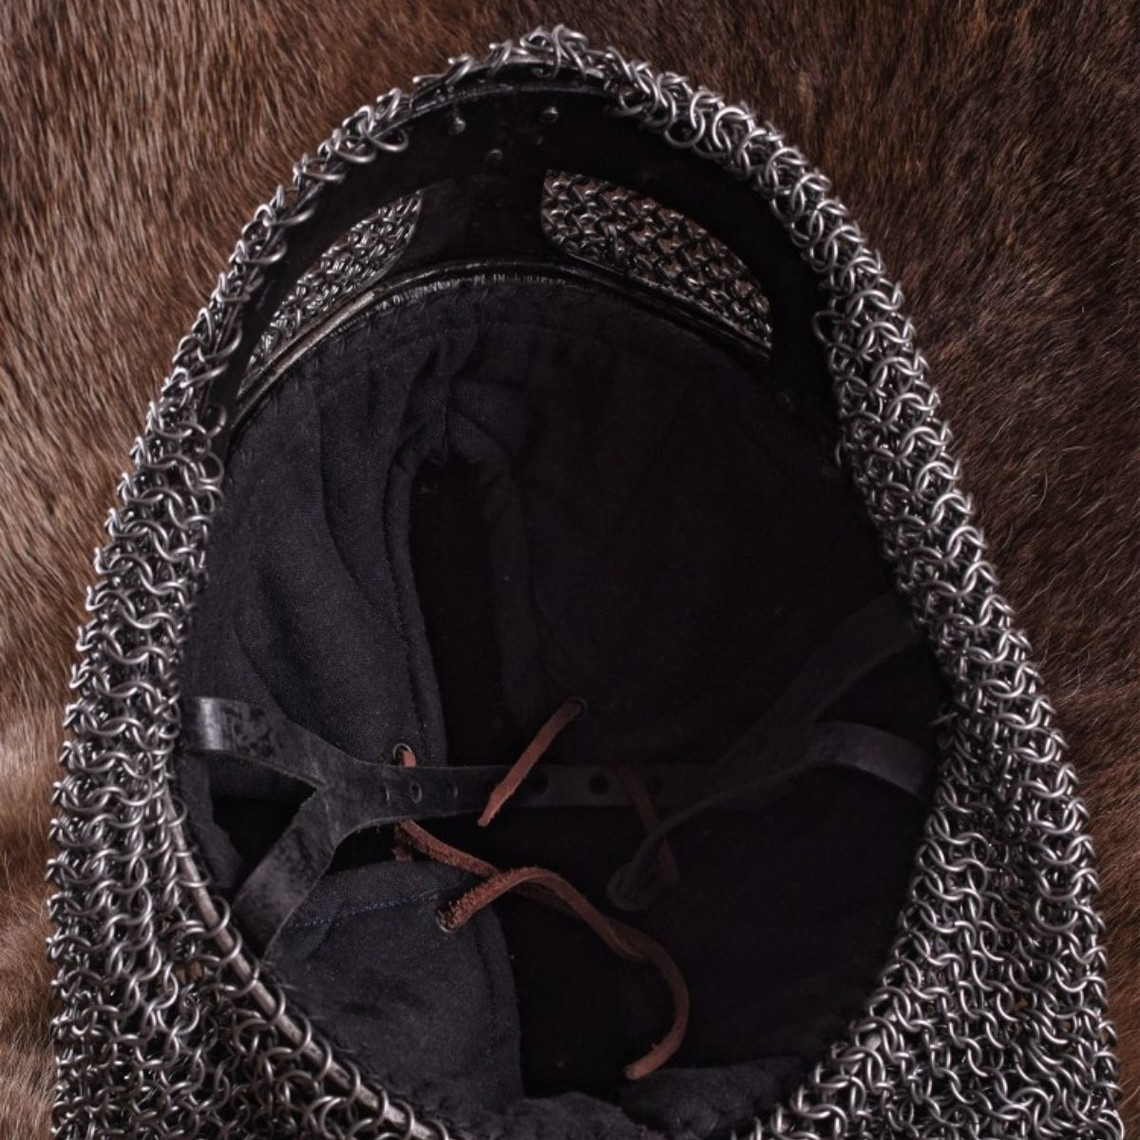 Ulfberth Wikingerbrillenhelm mit Kettenhemd 1,6 mm